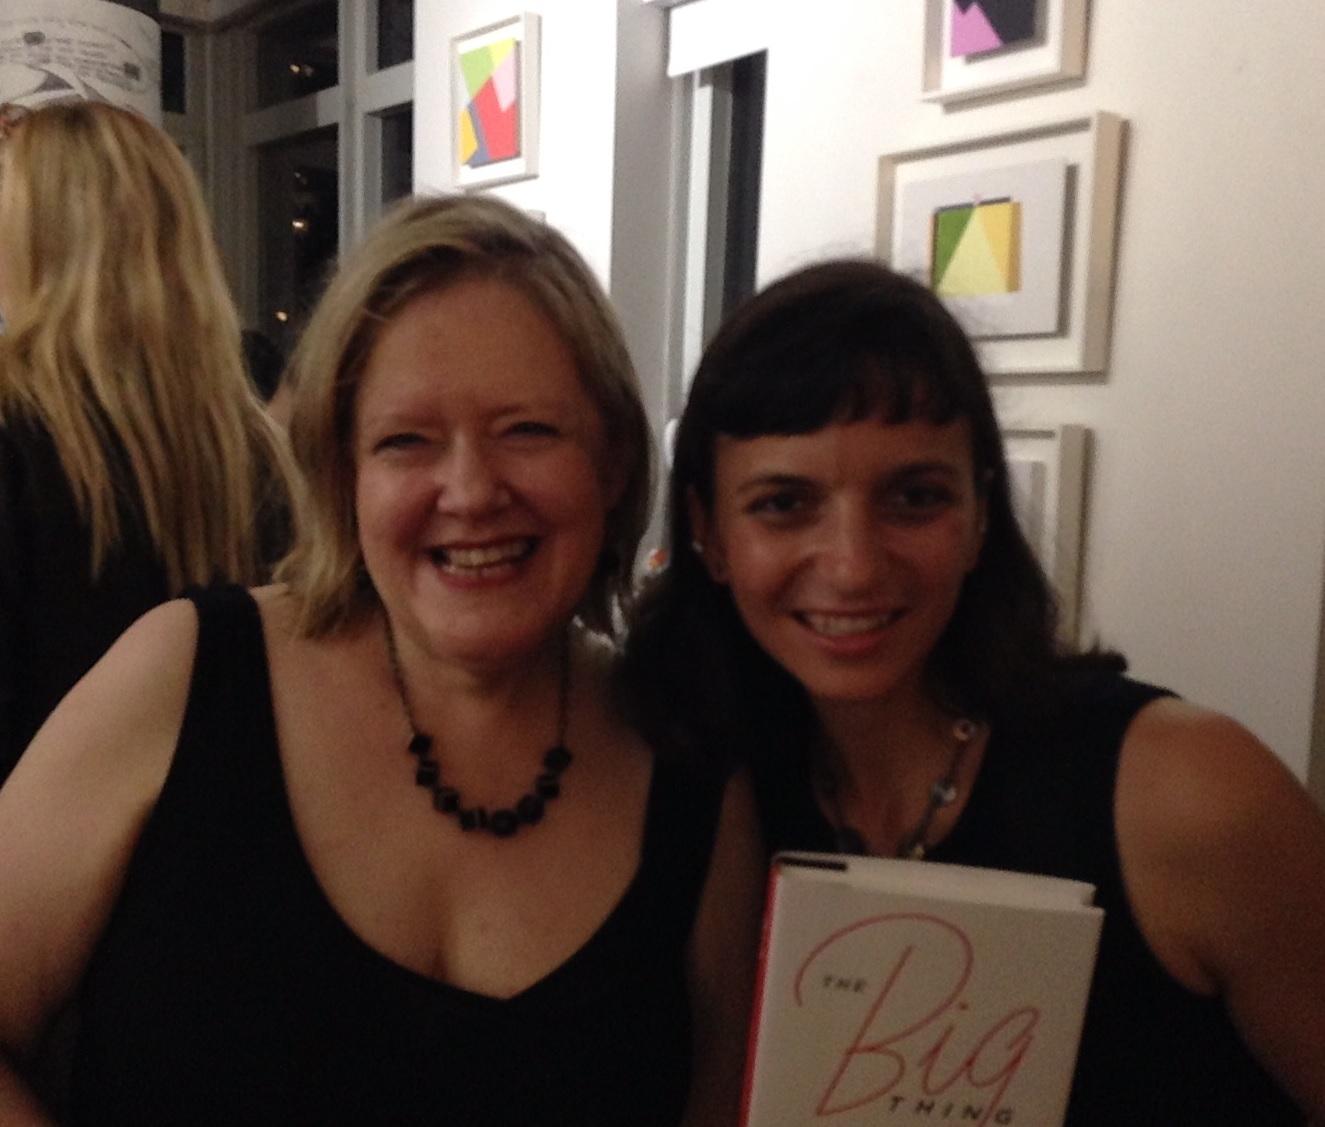 phyllis Korkki & me at the big thing launch (aug 2016)